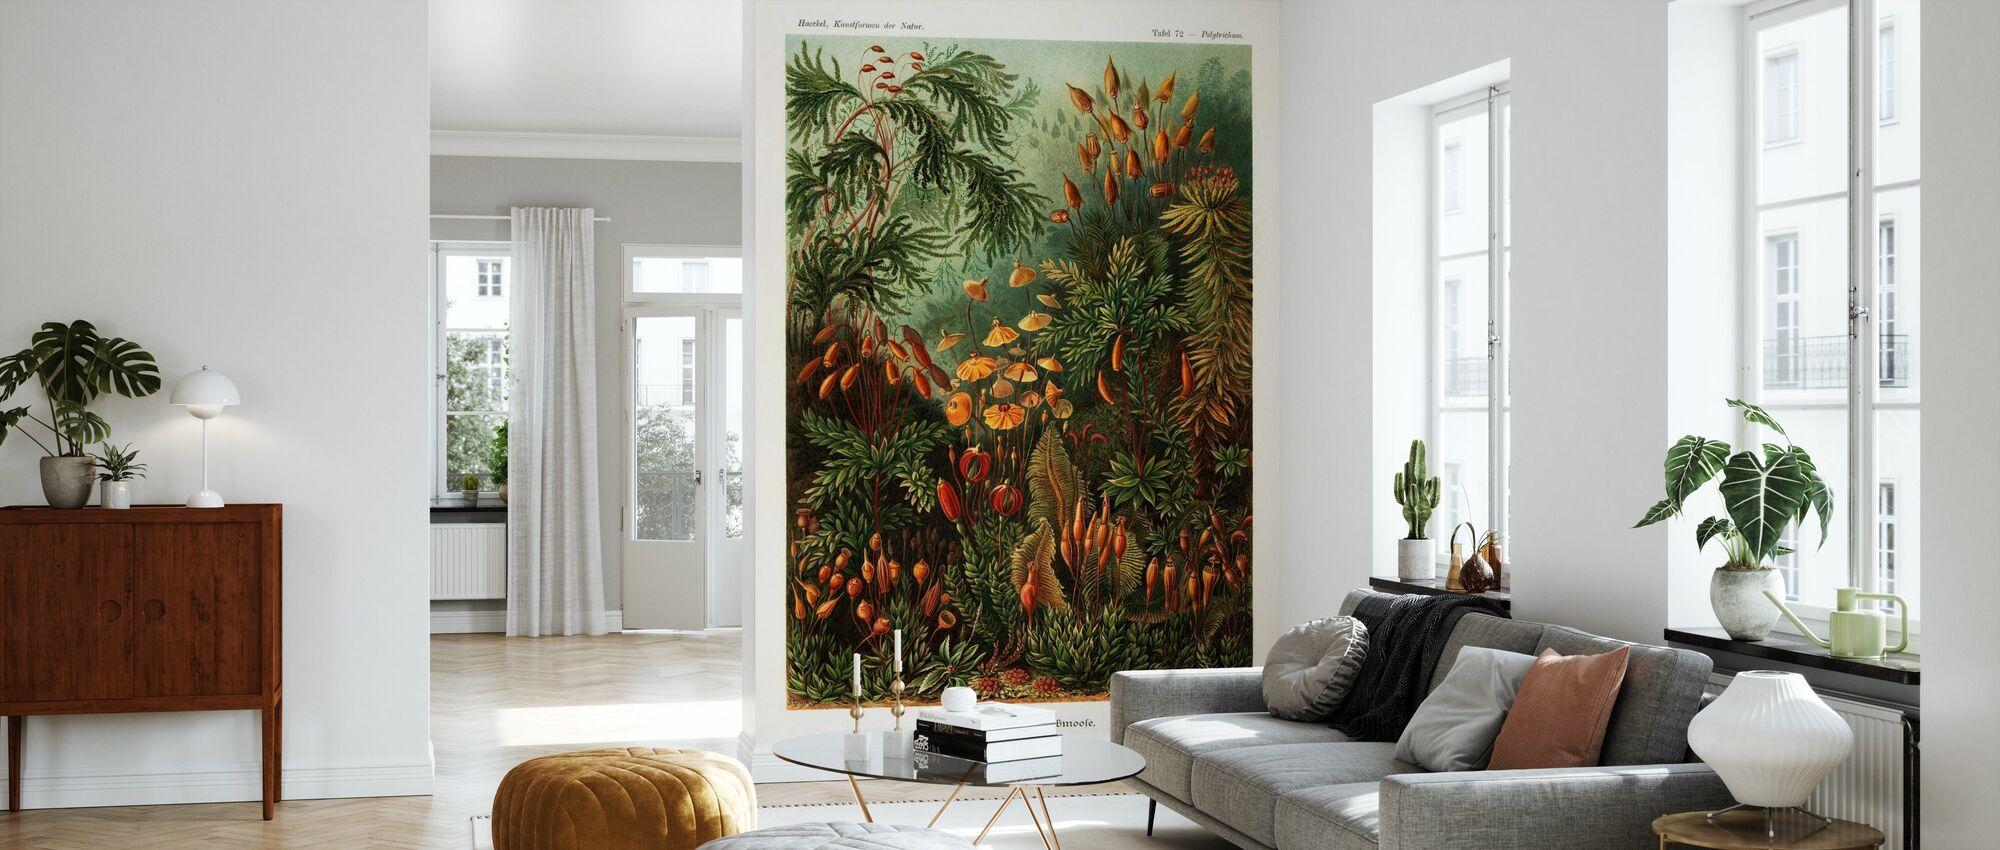 Muscinae Moss Art Forms - Ernst Haeckel - Wallpaper - Living Room